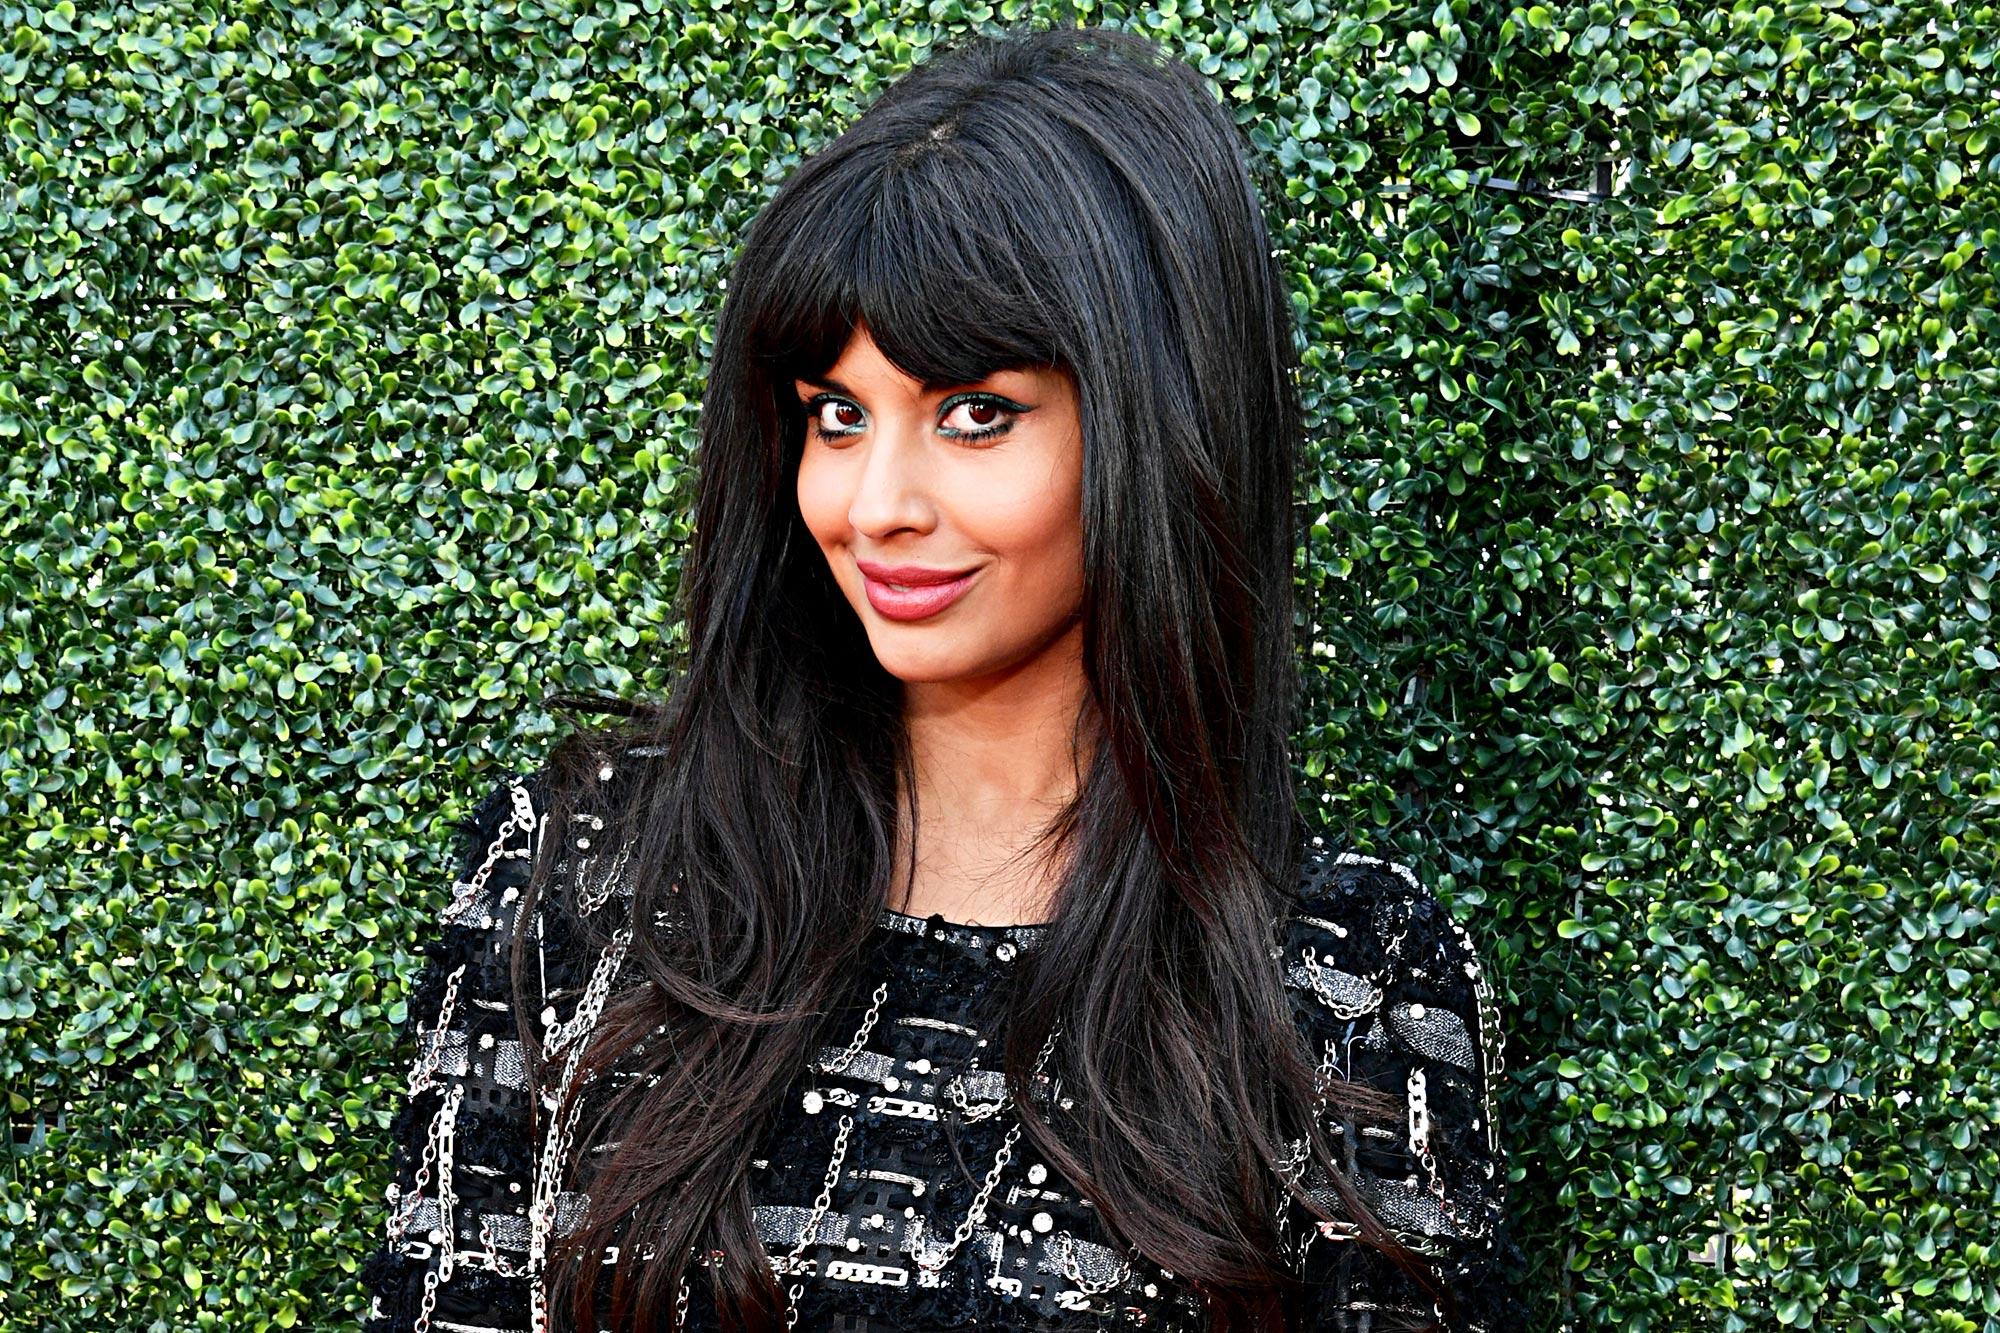 Jameela Jamil attends the 2019 MTV Movie and TV Awards at Barker Hangar on June 15, 2019 in Santa Monica, California.